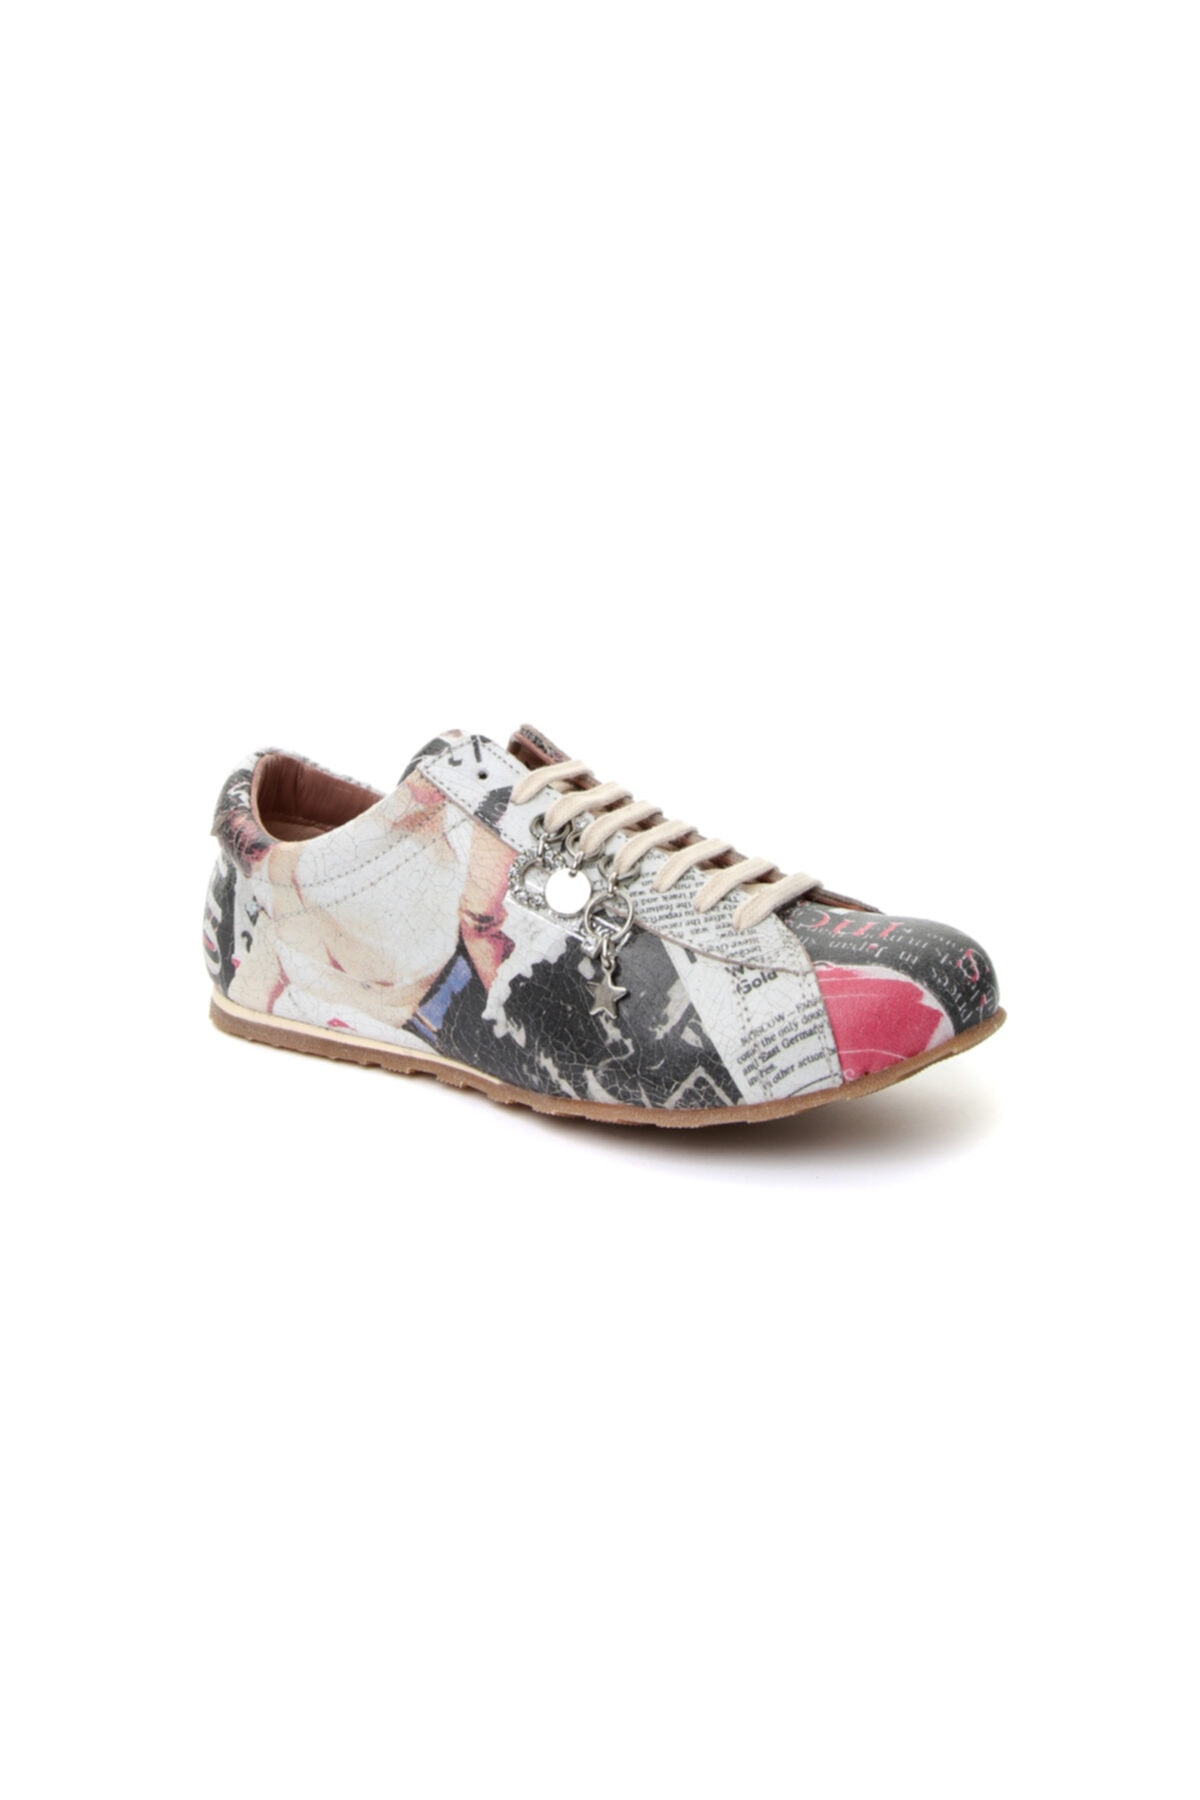 Kowalski  Kadın / Kız Sneaker 3129/c Kowalskı Footwear 1